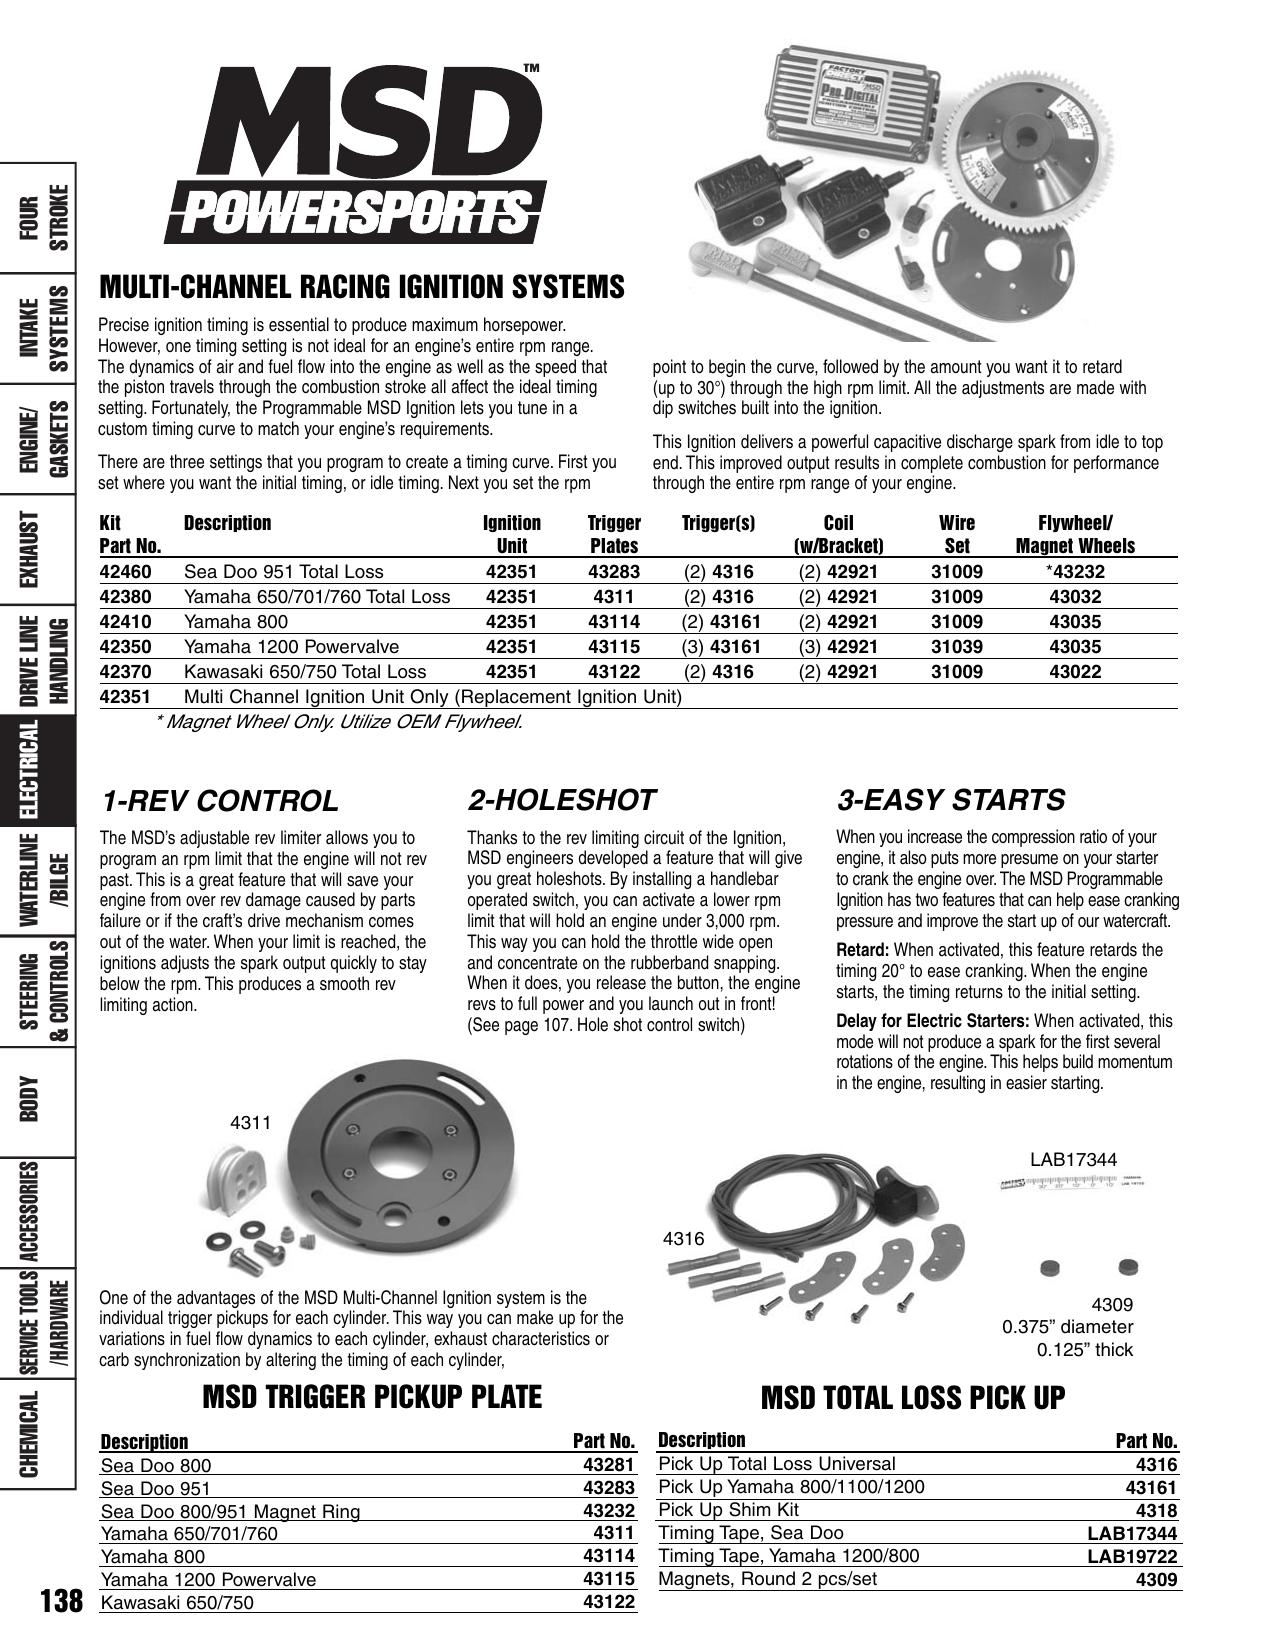 Yamaha Xlt800 Waverunner 2004 User Manual Manualzz